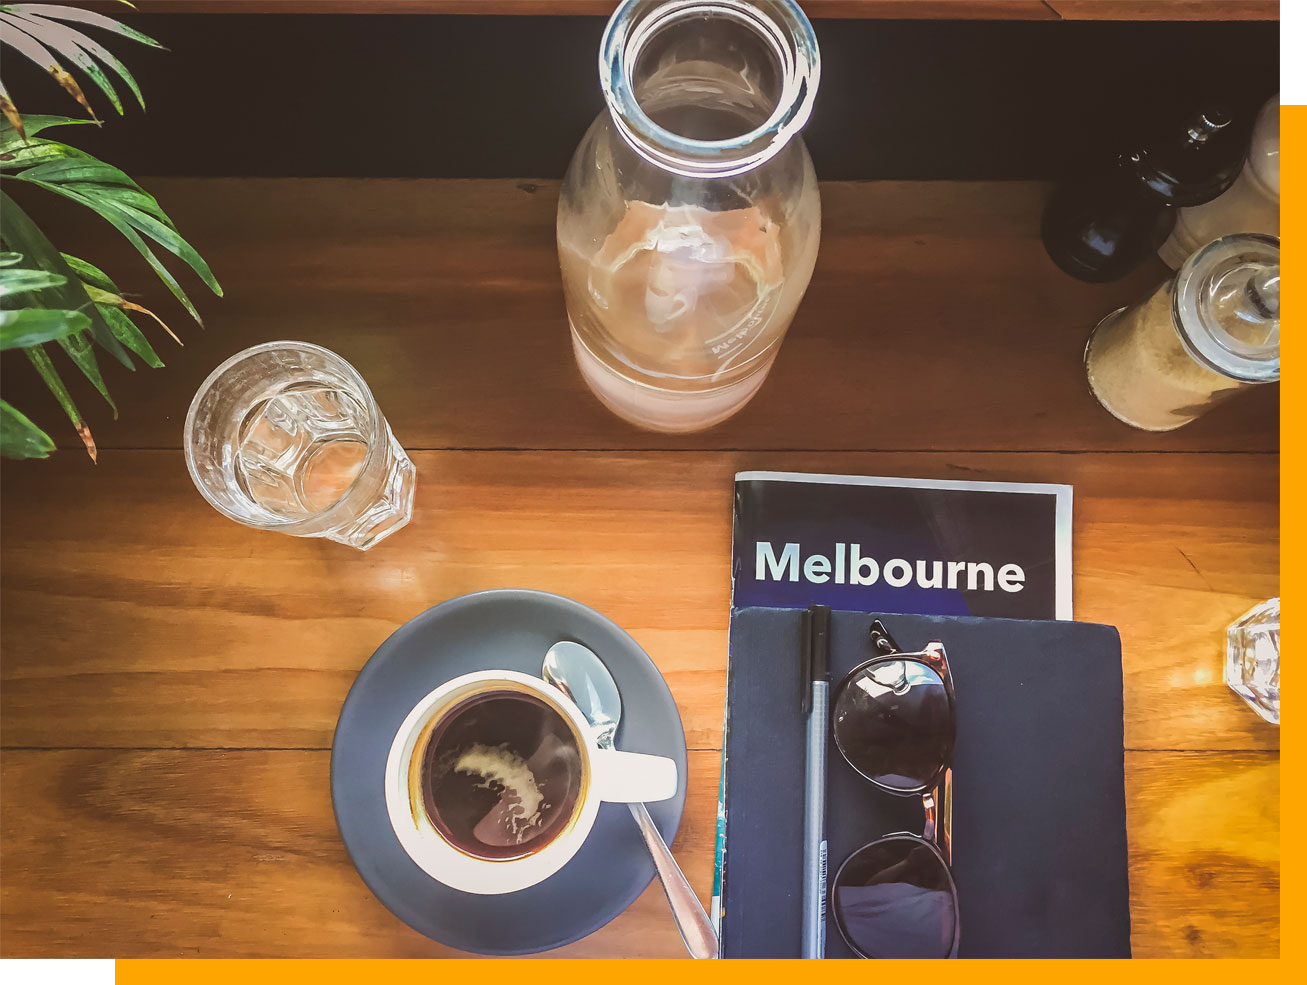 Мельбурн (Австралія). Крейзі Лама